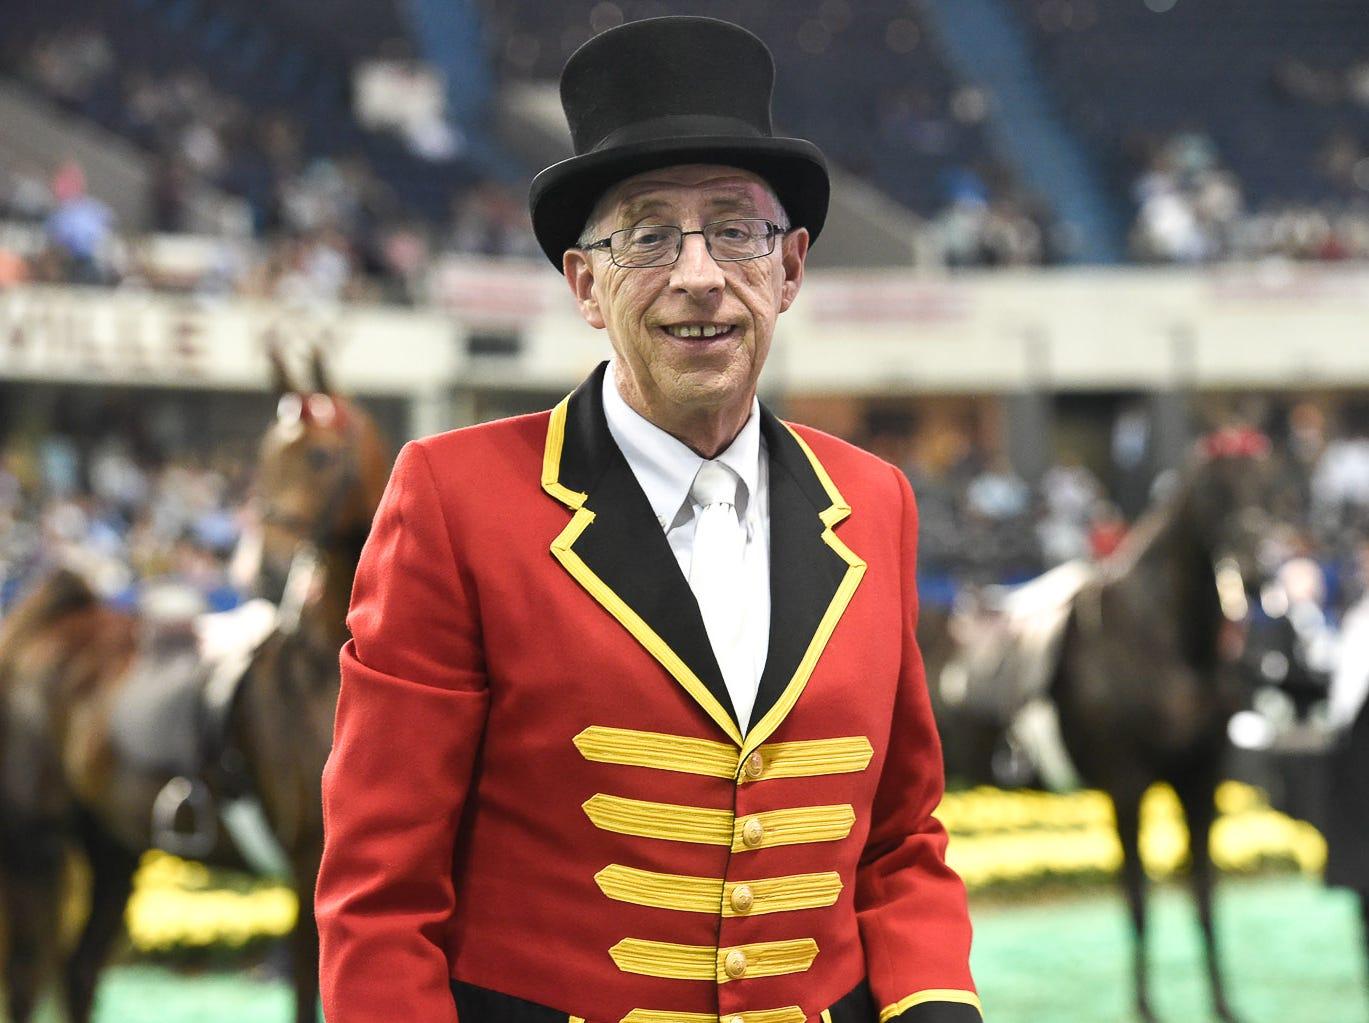 Ringmaster John Fry